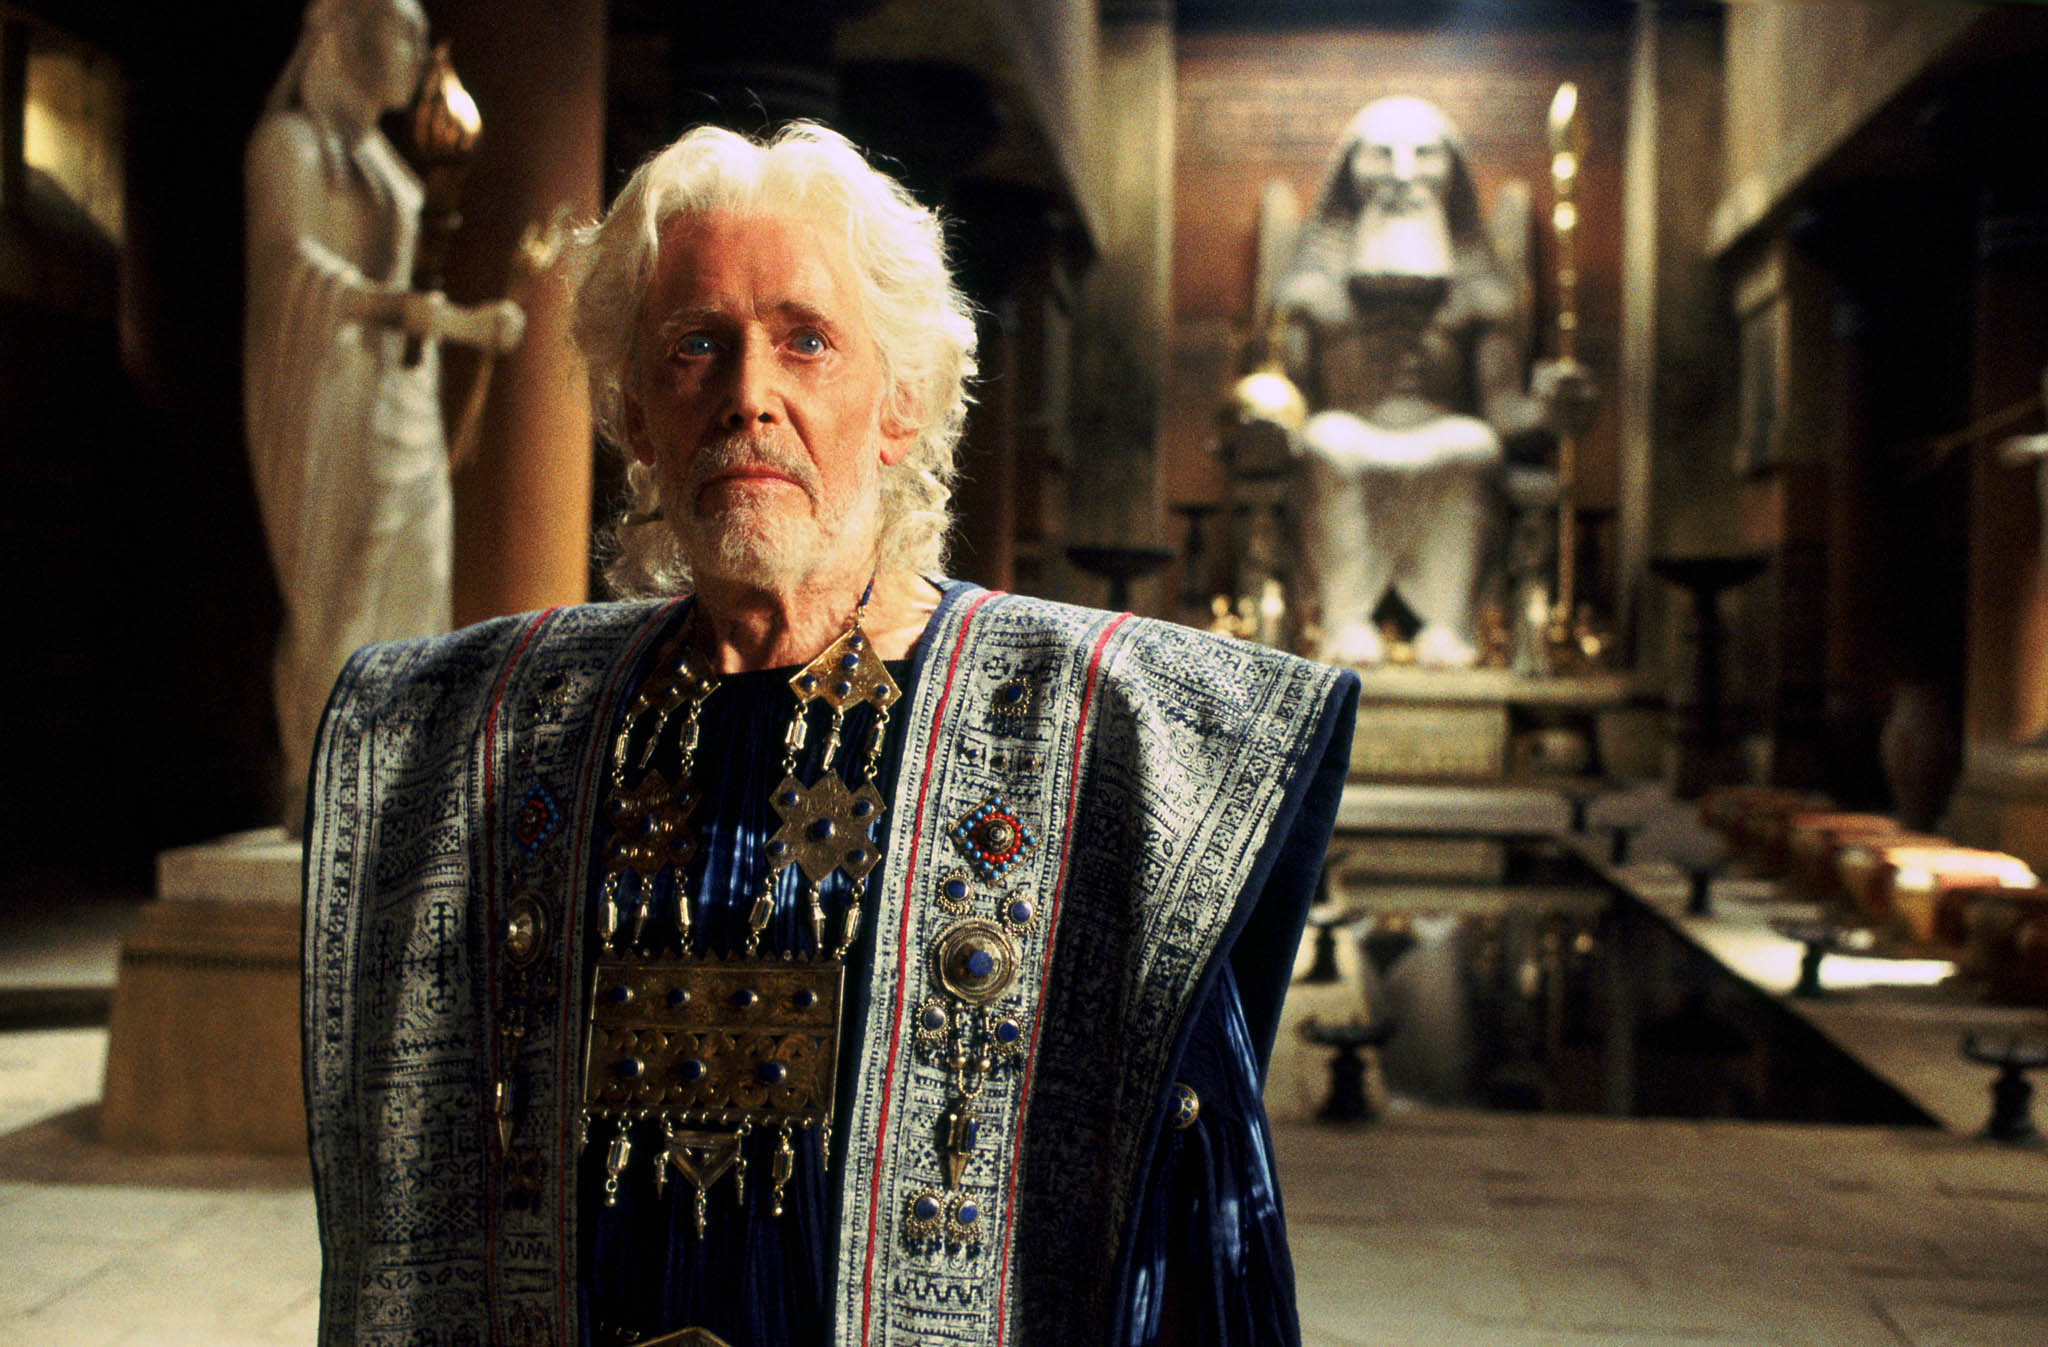 Quiz για την αρχαία Ελλάδα. Ποιος βασίλεψε στην Αθήνα, ποιος ήταν ο πρώτος βασιλιάς της Σπάρτης, ποιος ίδρυσε τη Θήβα